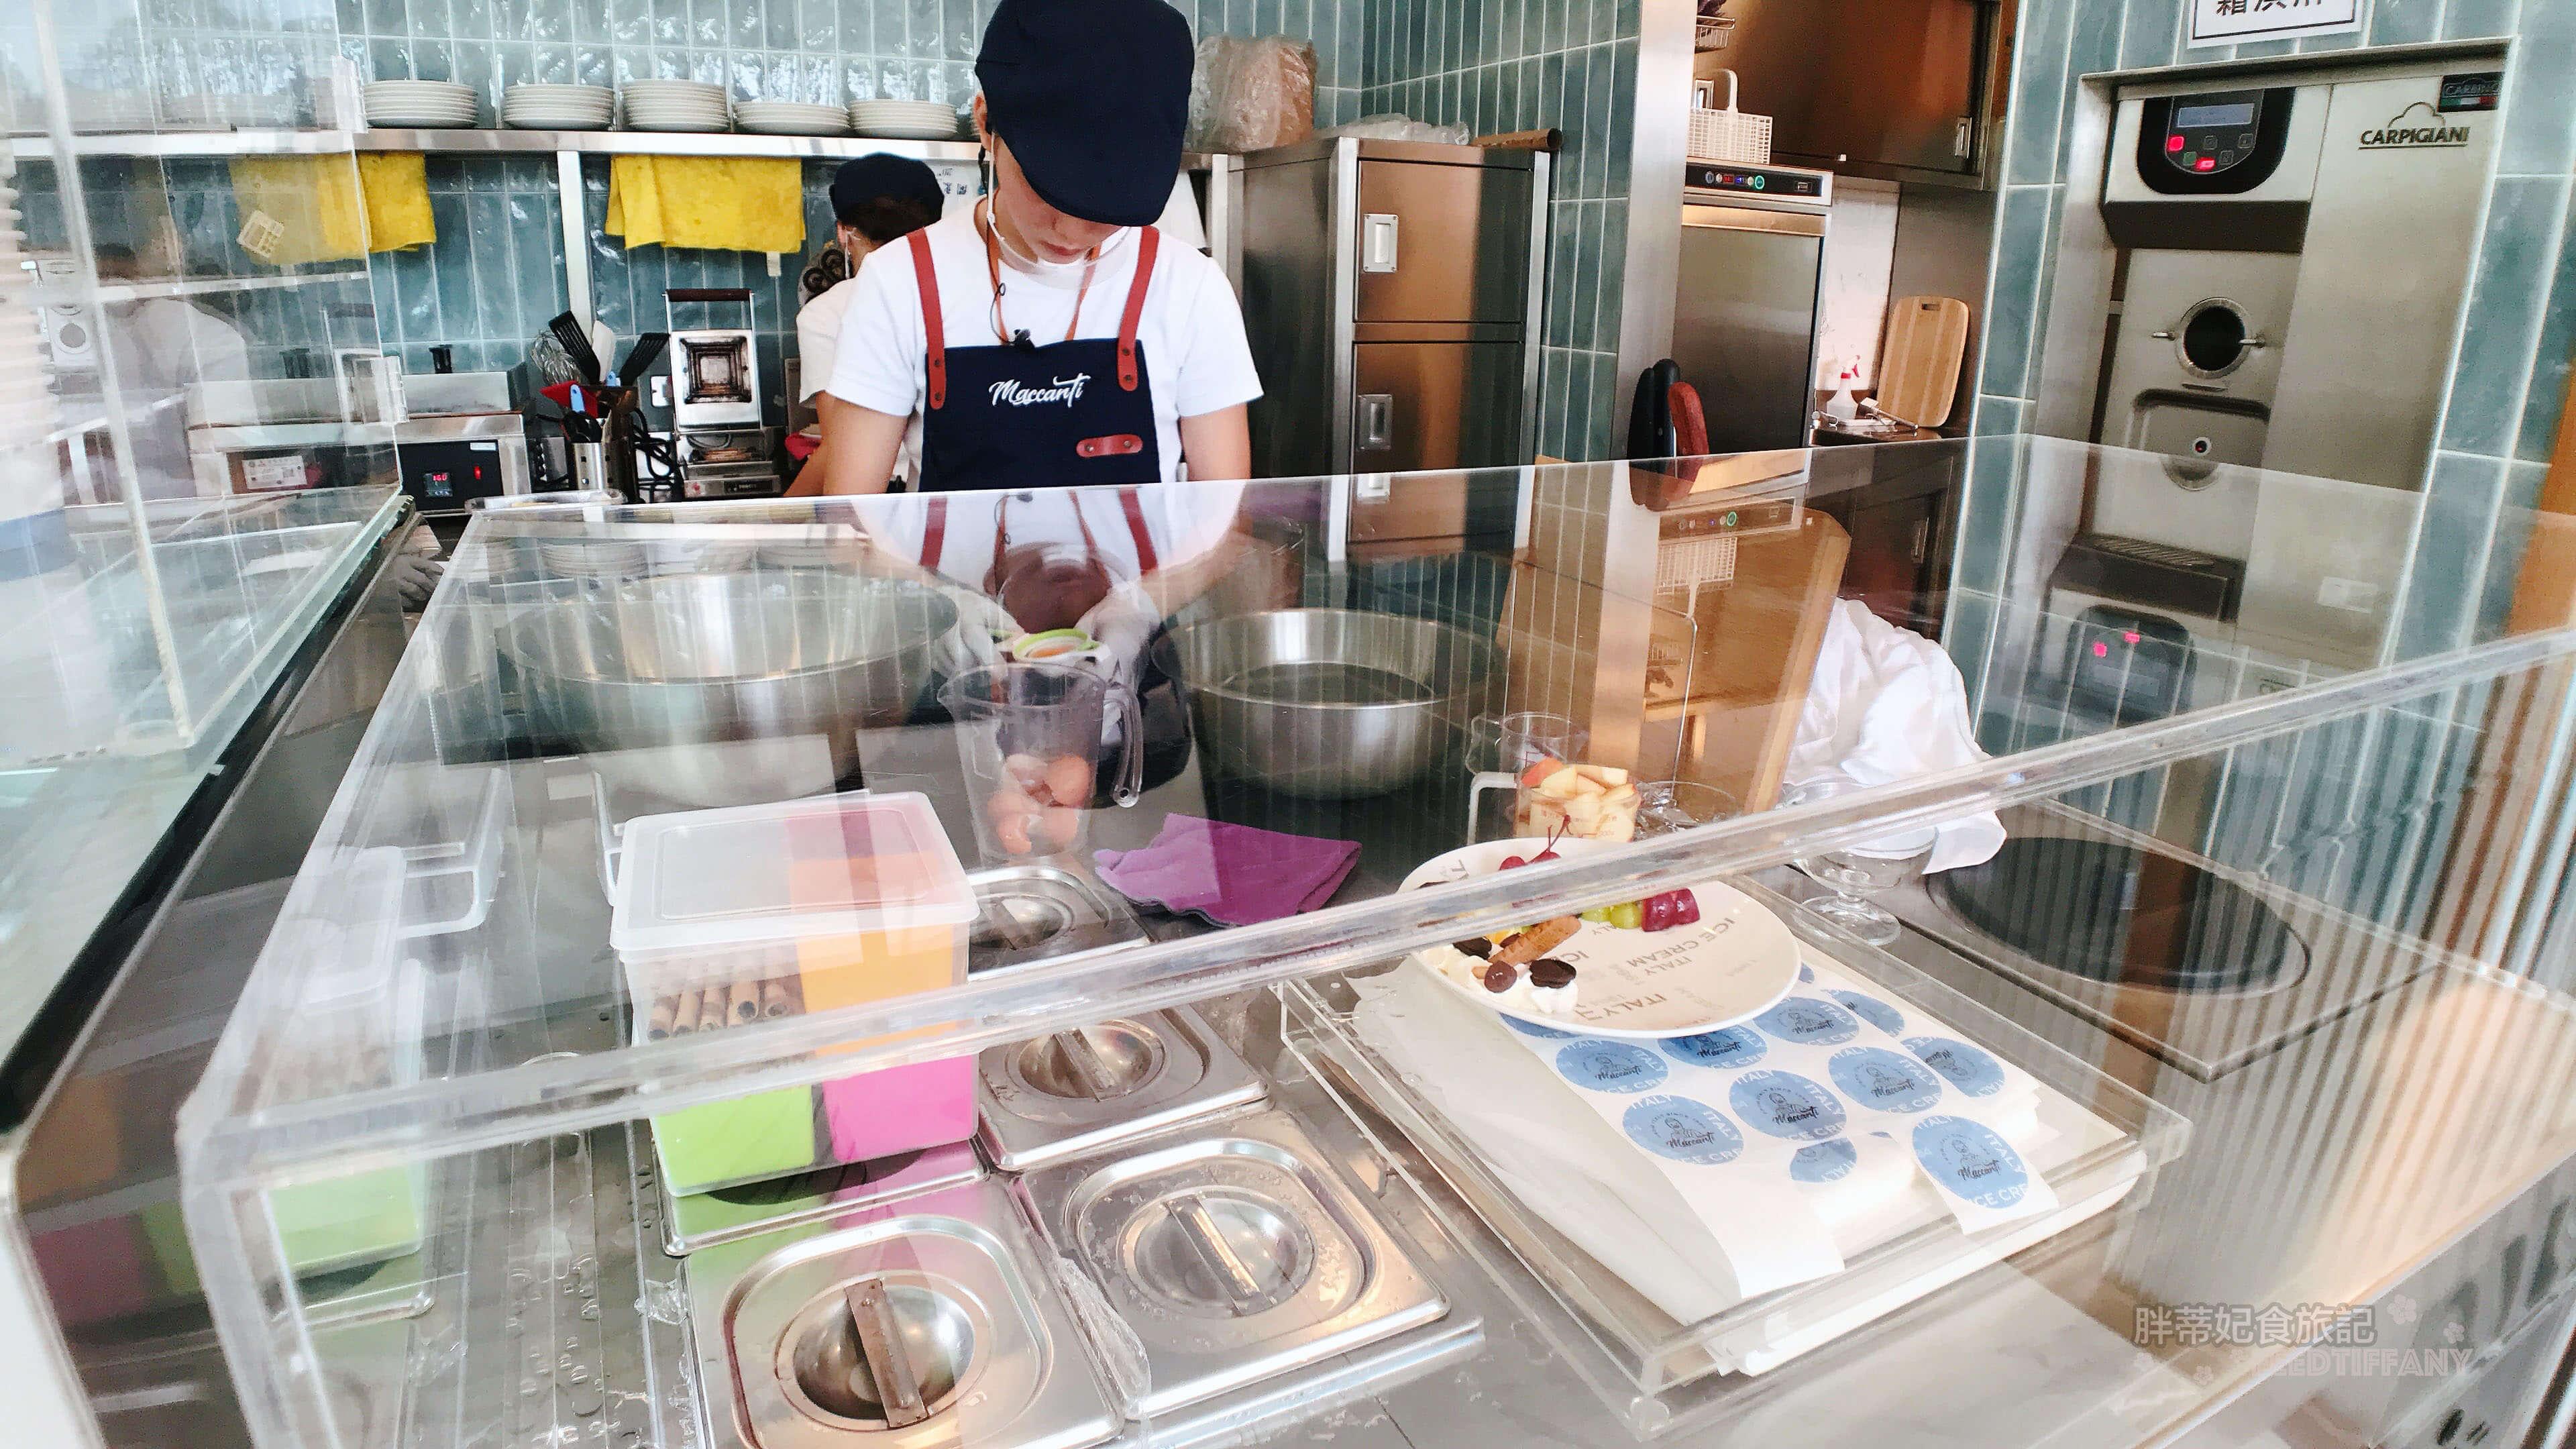 Maccanti馬卡諦義大利冰淇淋 鬆餅工作台